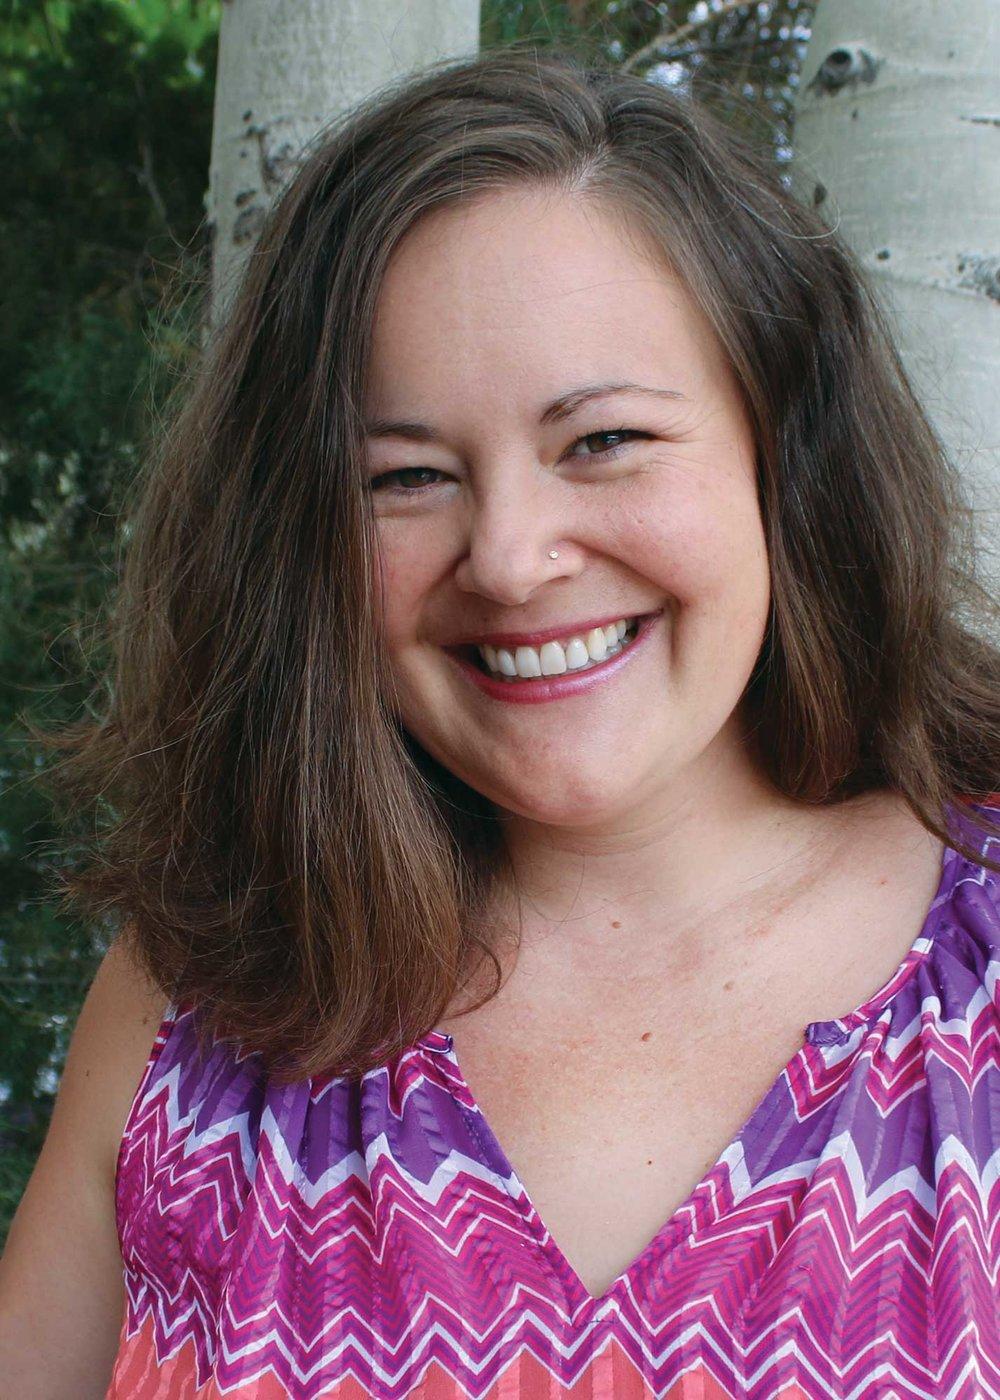 Taos Whole Health Integrative Care - Celeste Griego